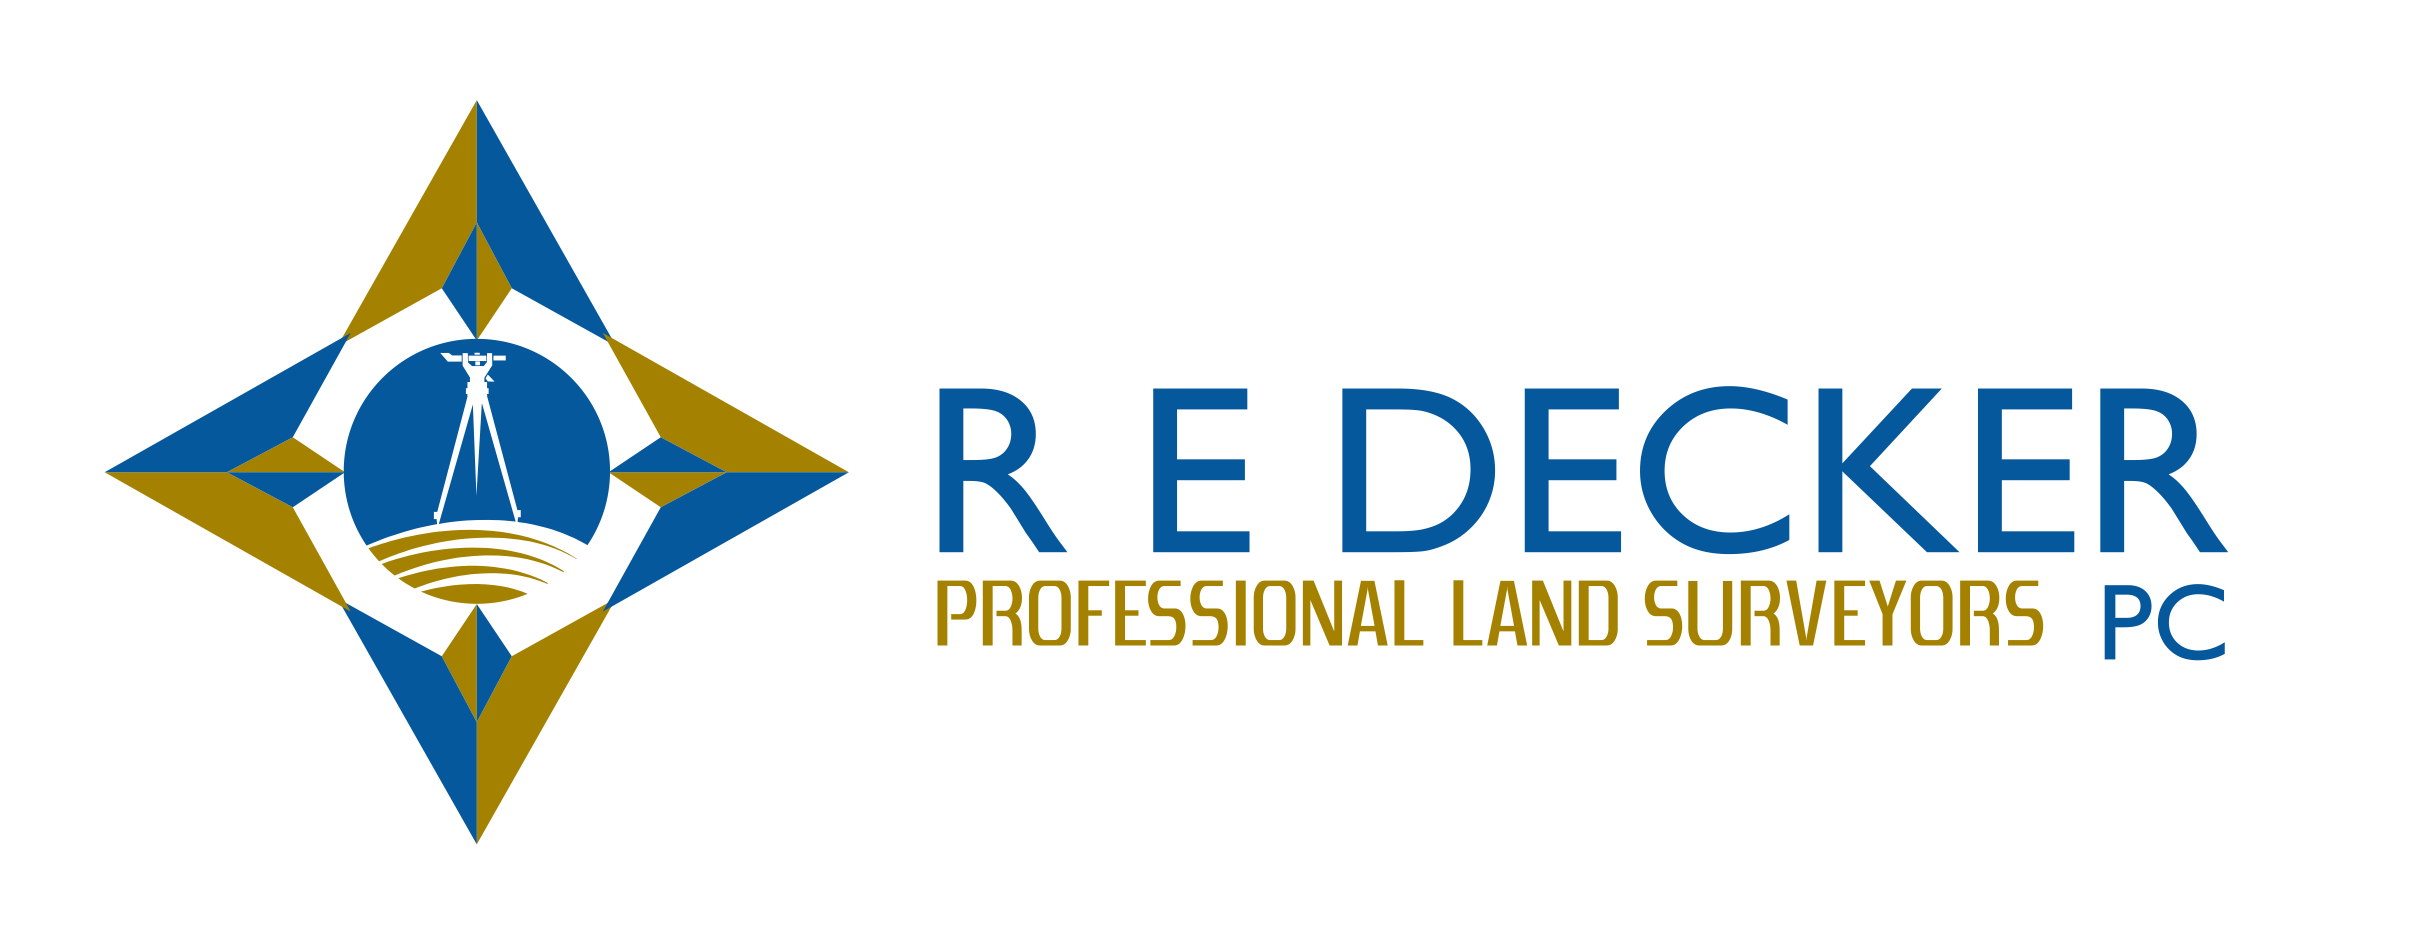 Construction Staking Libertyville Land Surveying Company